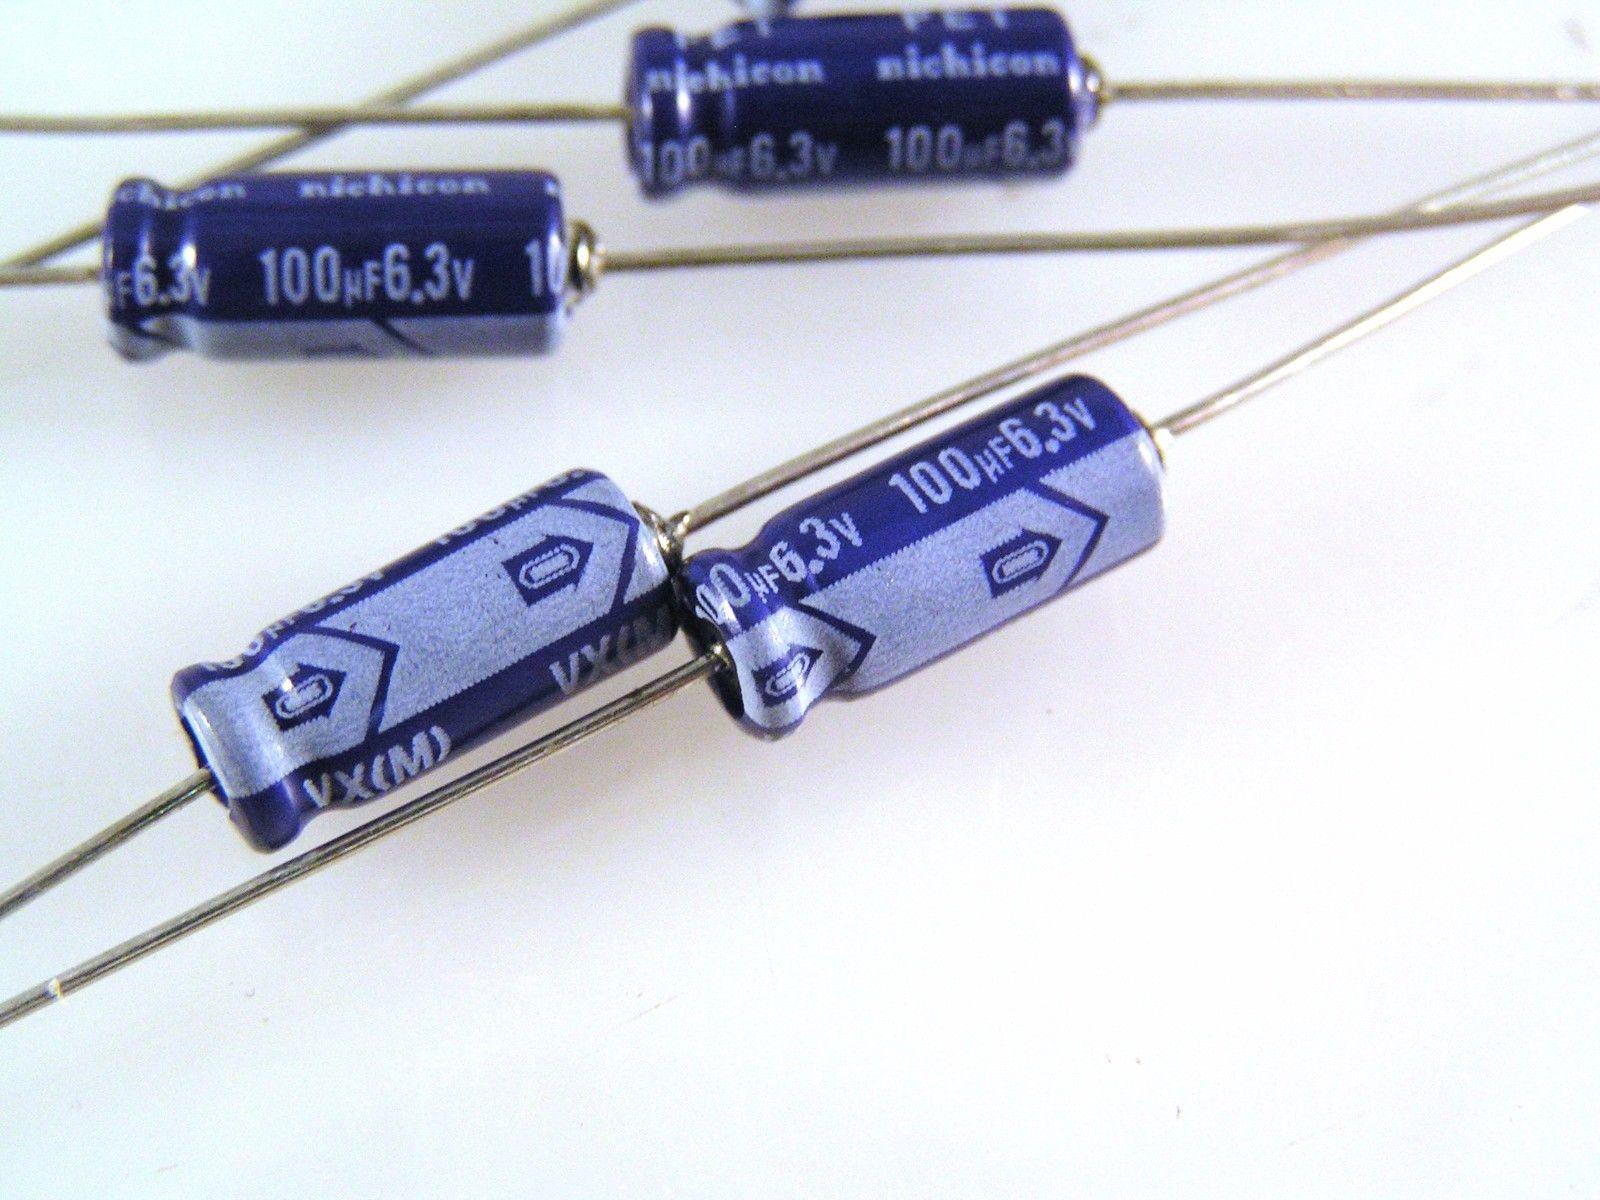 Precision rc 130A watt meter and power analyzer LCD gt-power 60VRKUS